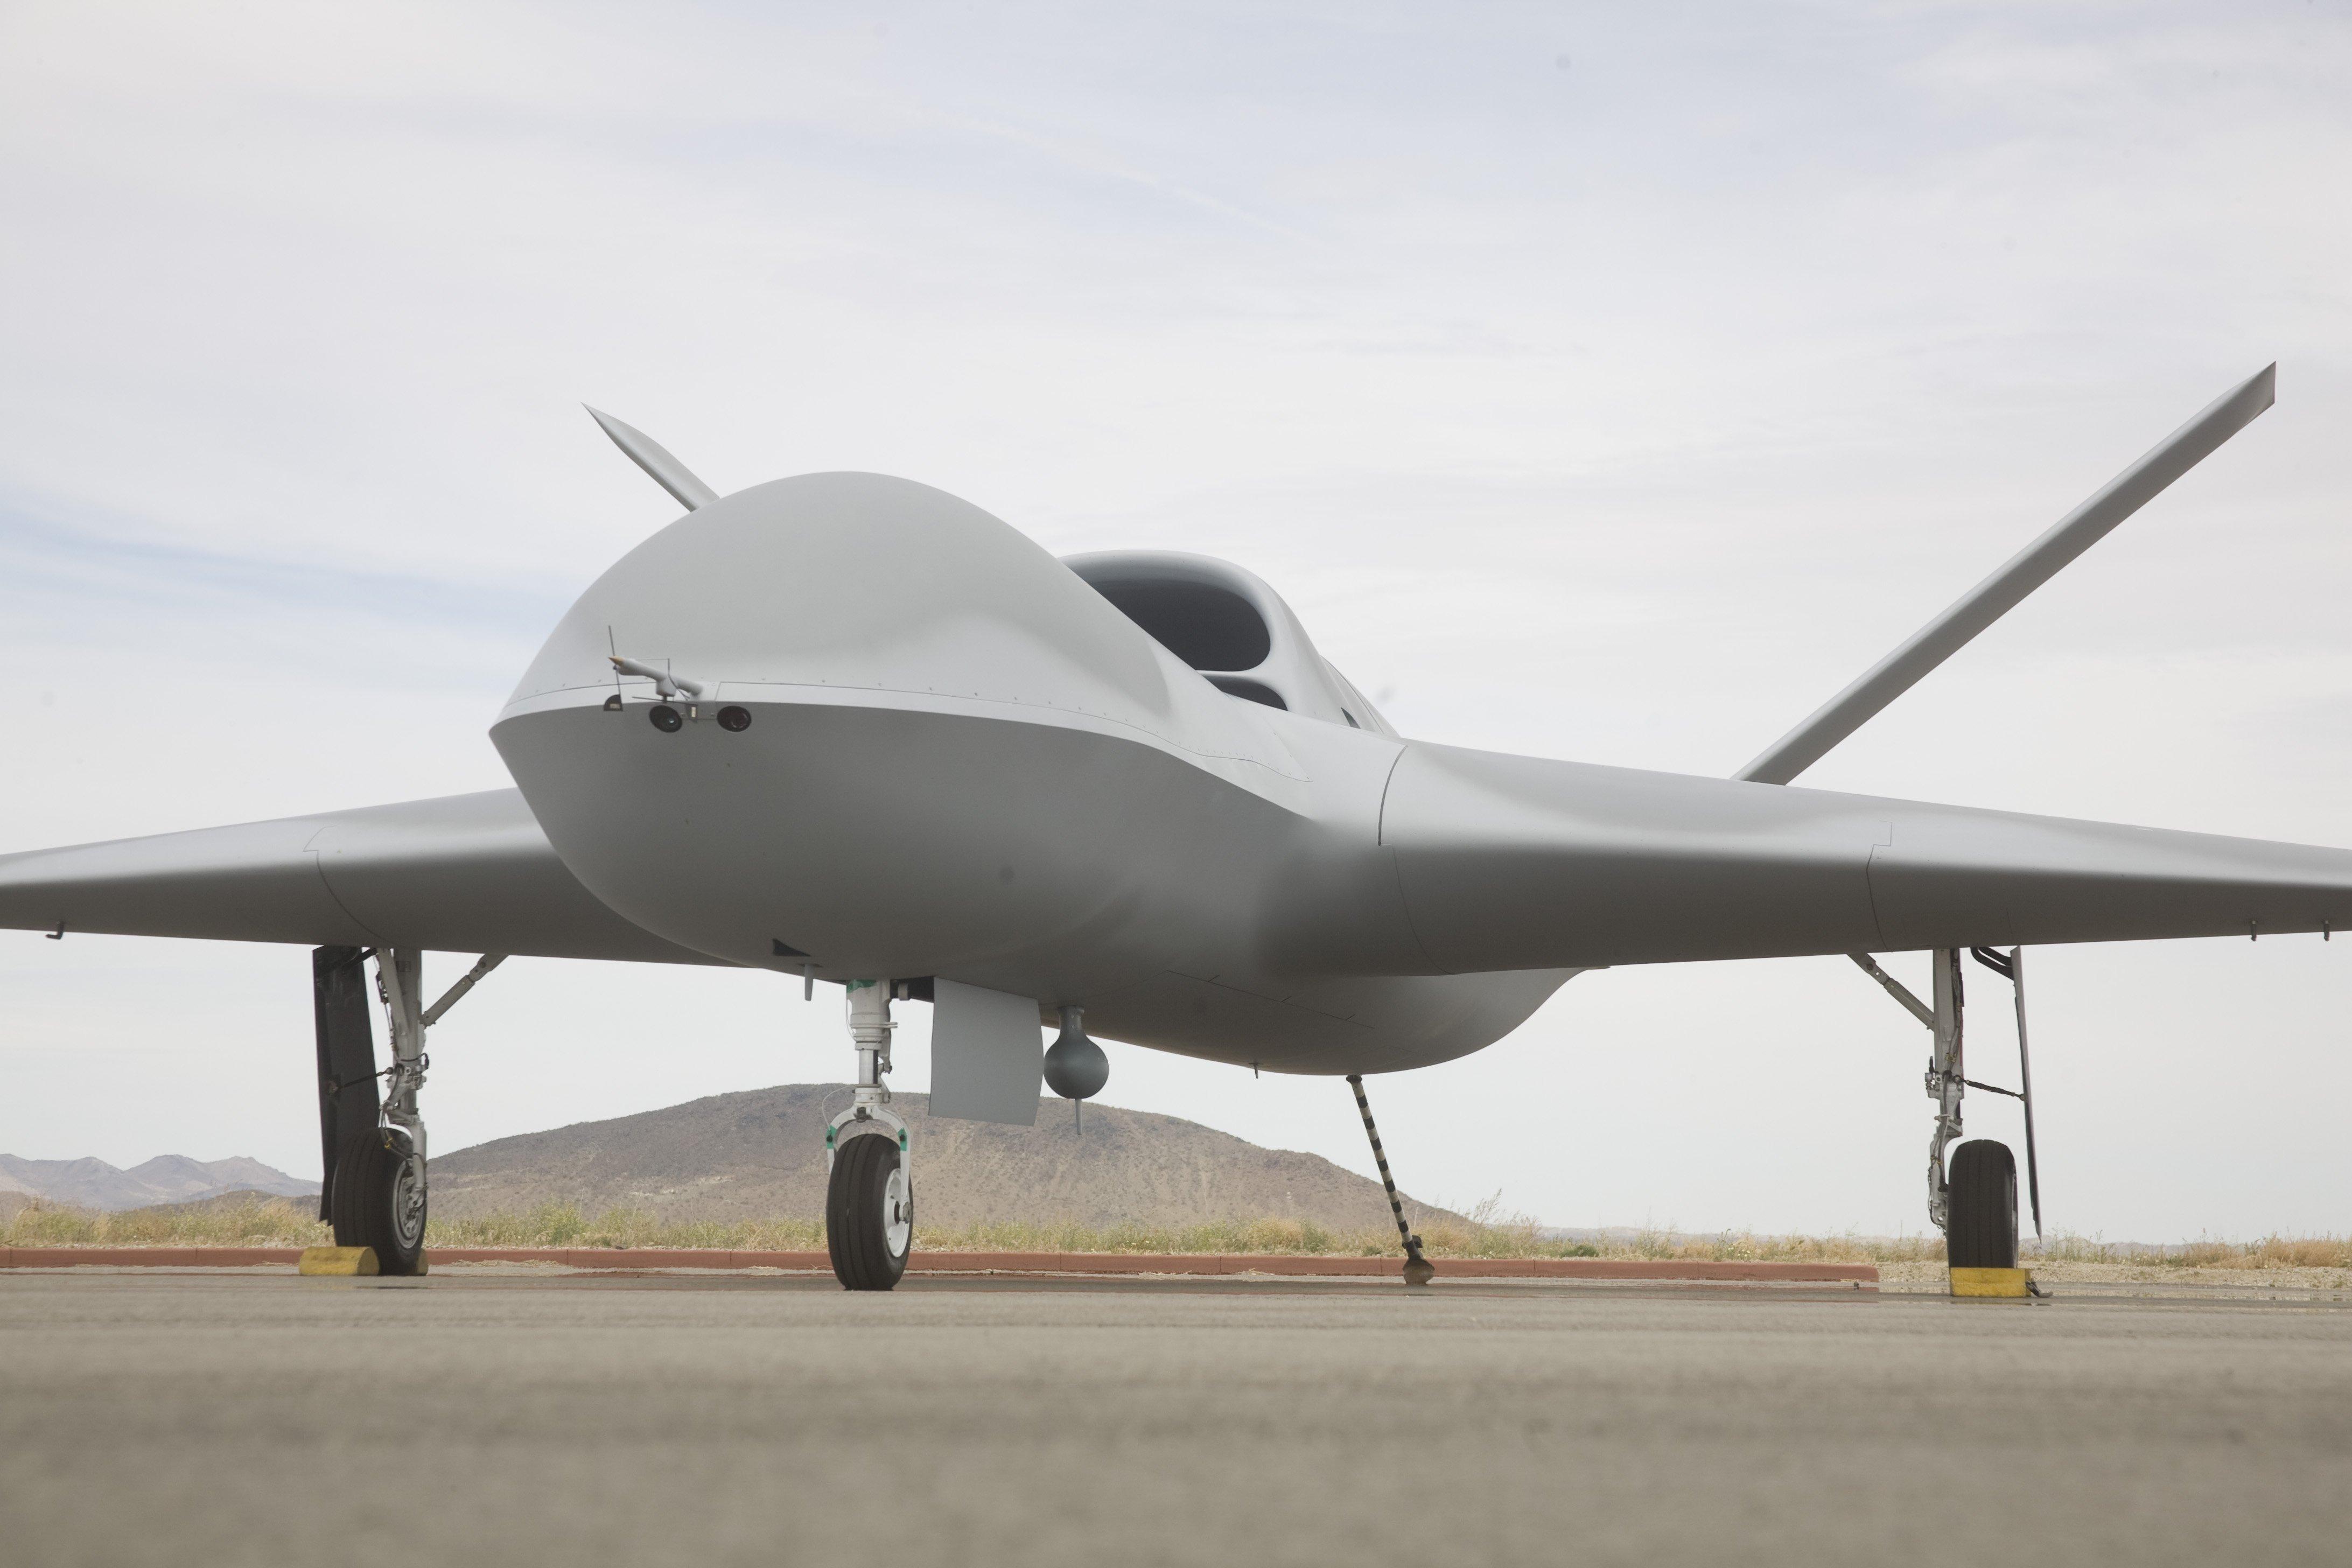 General Atomics Unwraps New Stealthy Robot War Jet The Register